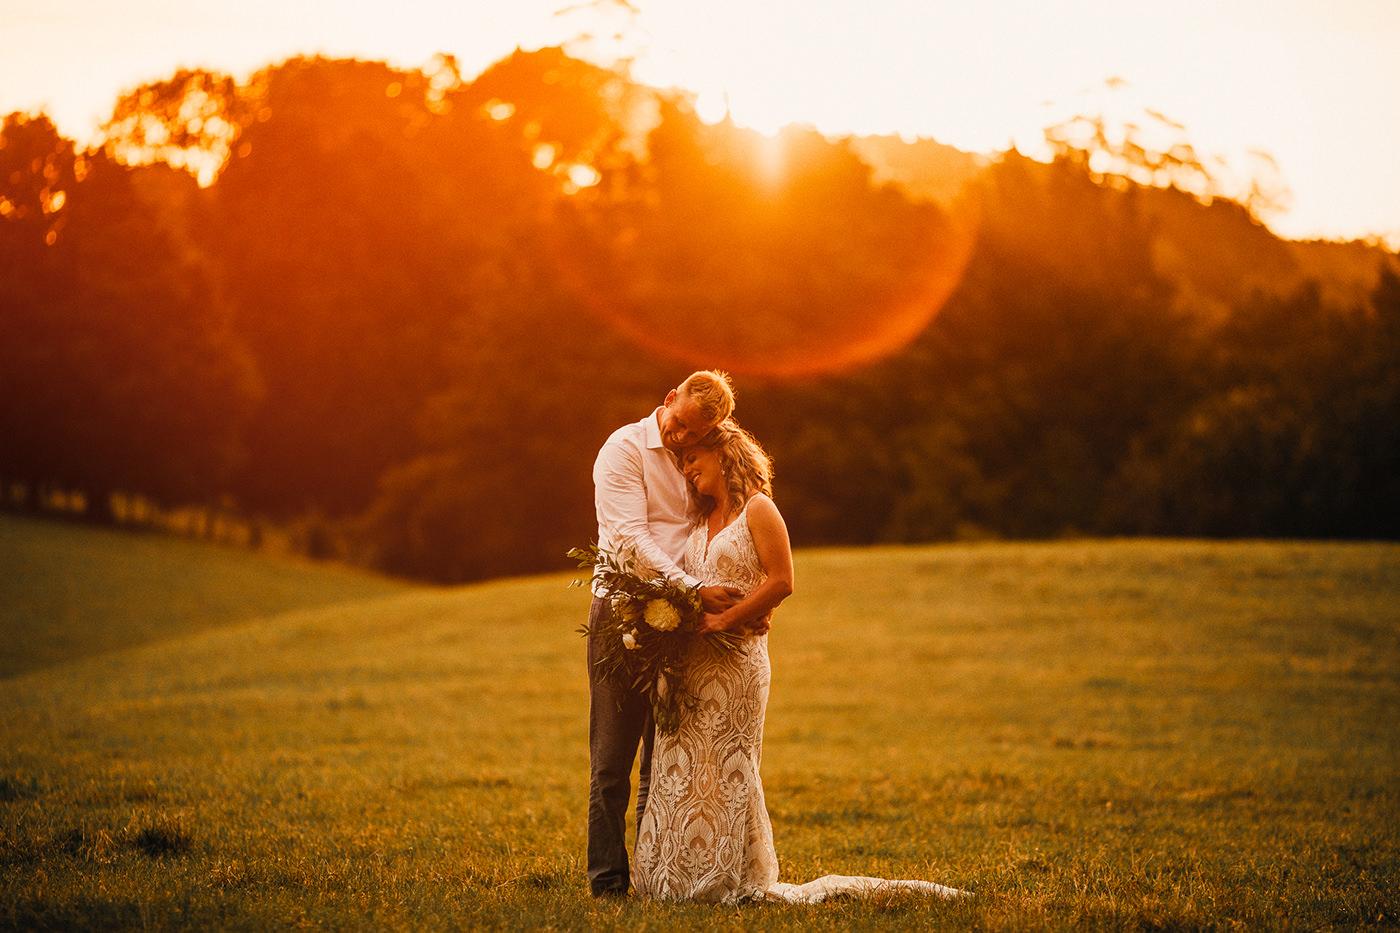 wedding_photographer_nz-00017.jpg